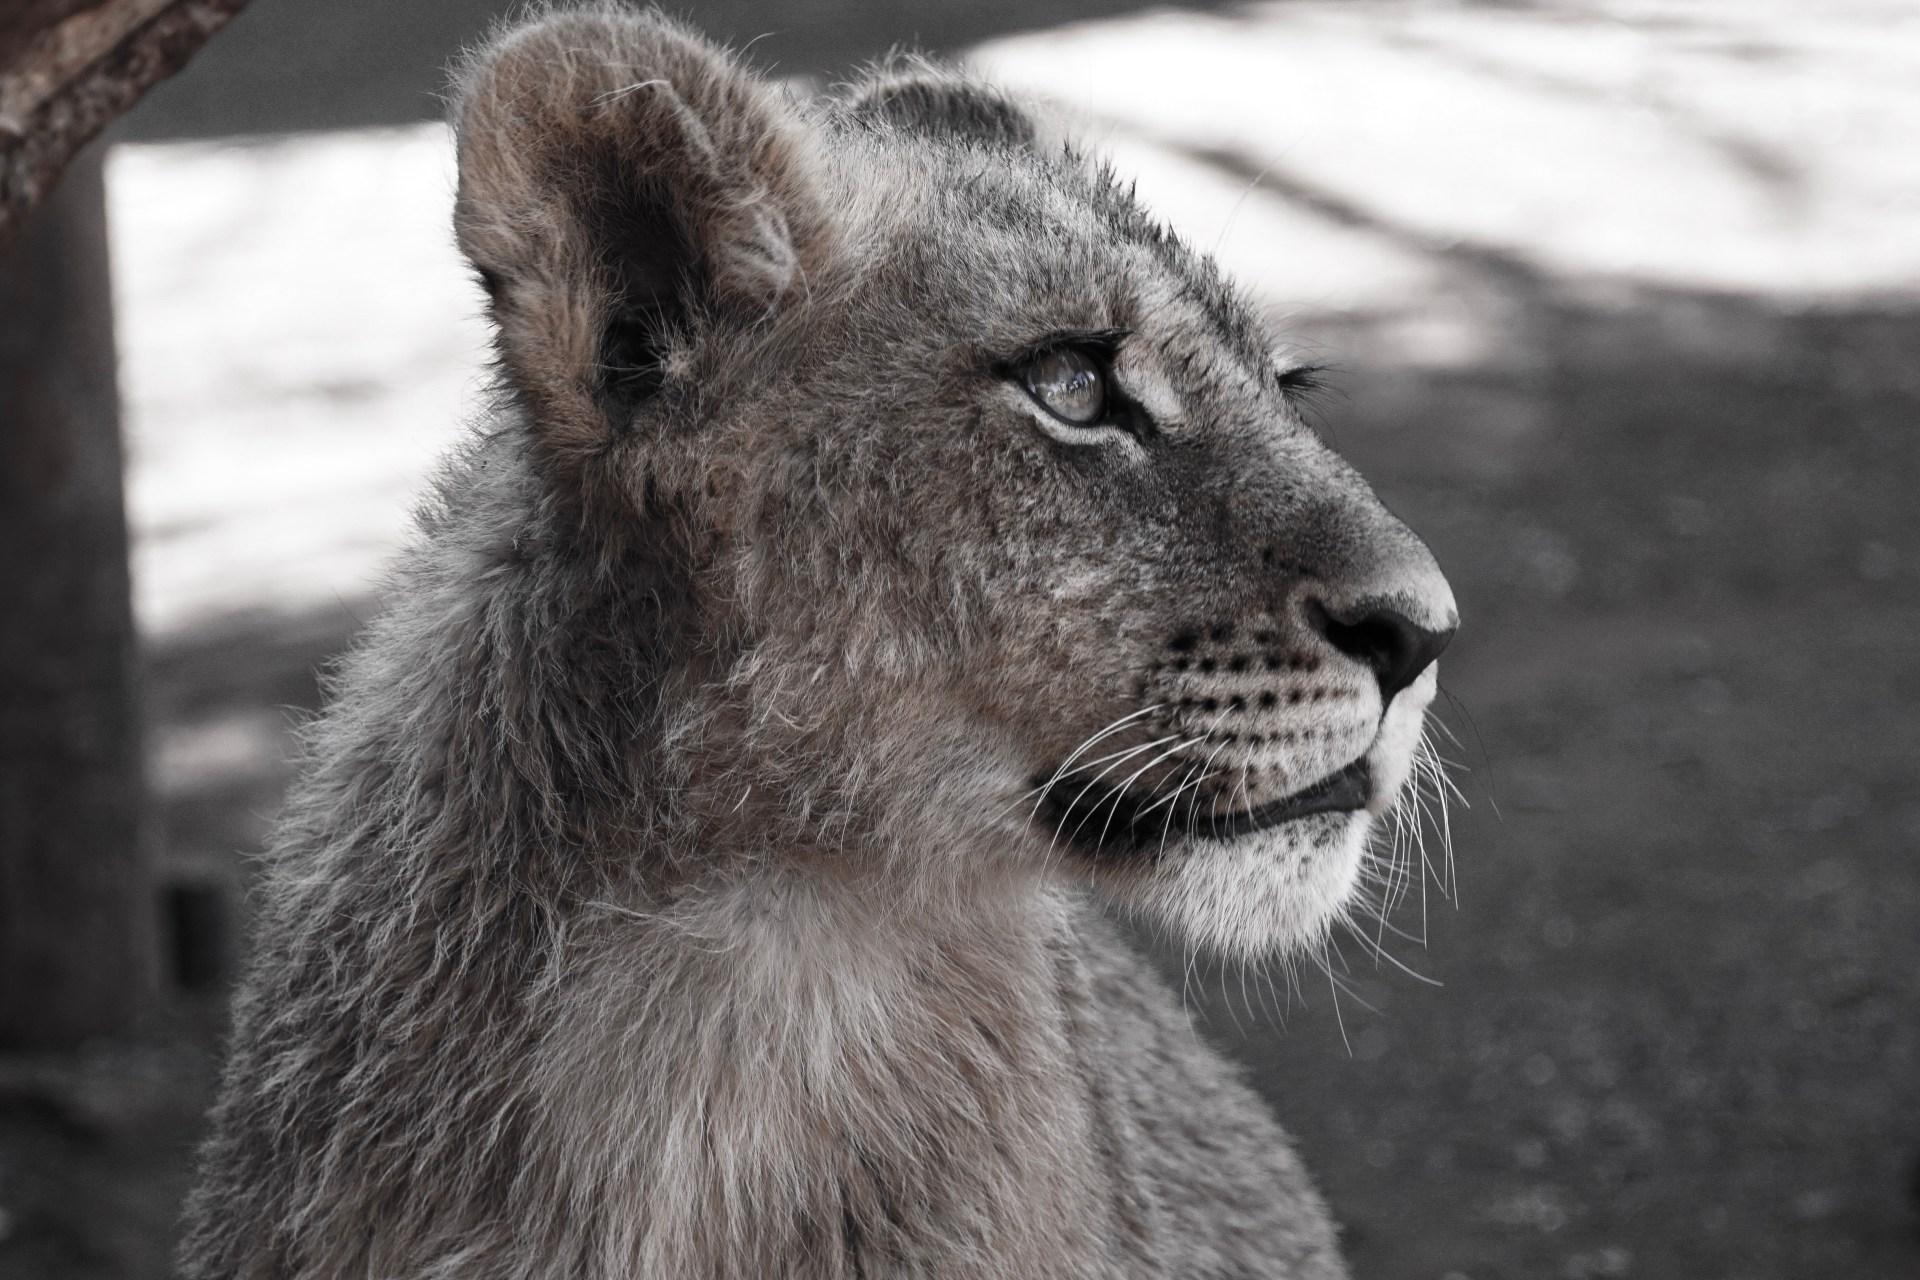 leeuw Ukutula Zuid-Afrika